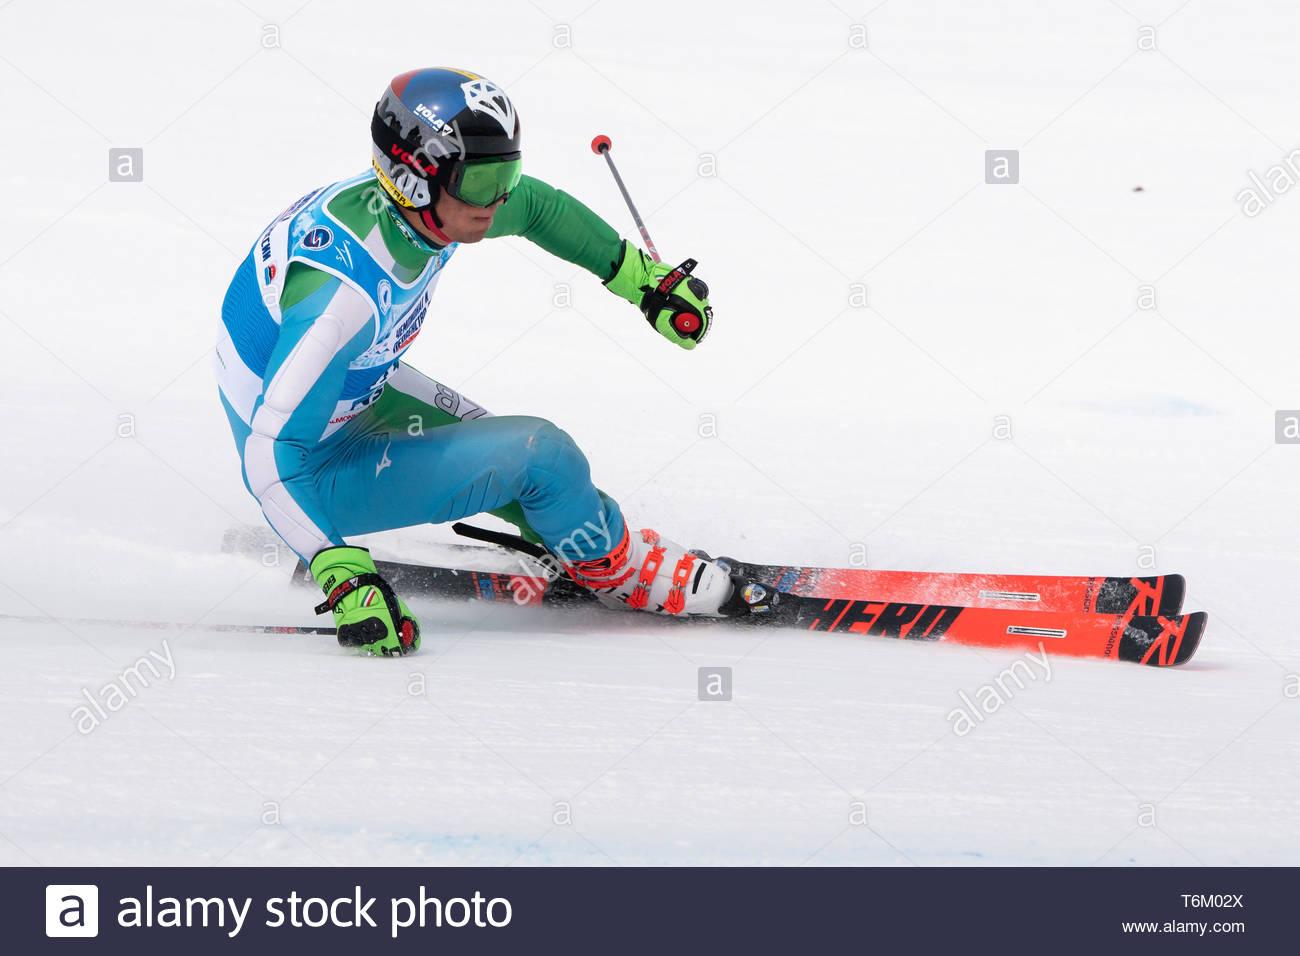 KAMCHATKA PENINSULA, RUSSIAN FEDERATION - APRIL 2, 2019: Mountain skier Komiljon Tukhtaev (Uzbekistan) skiing down snowy mountain slope. International - Stock Image